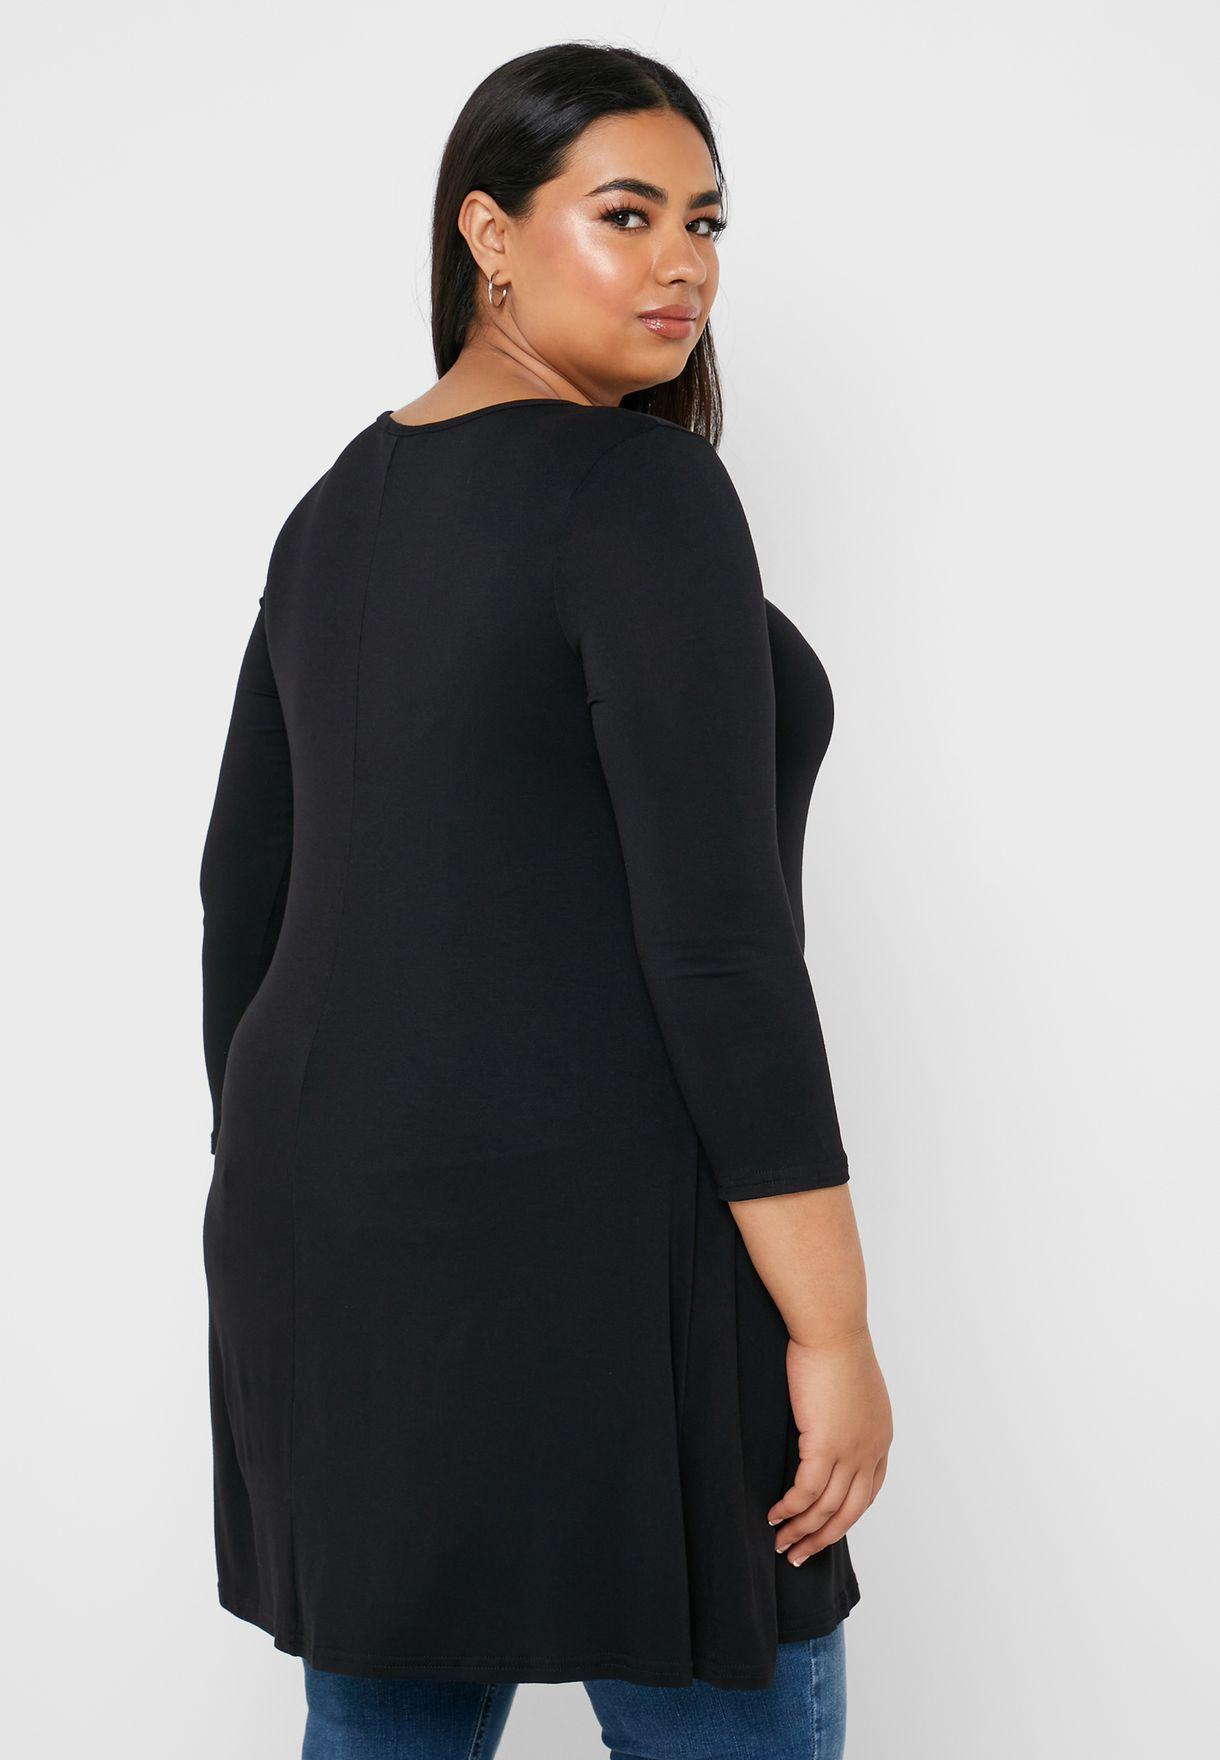 Buy Evans Black Crew Neck Longline Top For Women, Uae 18808at44wgp